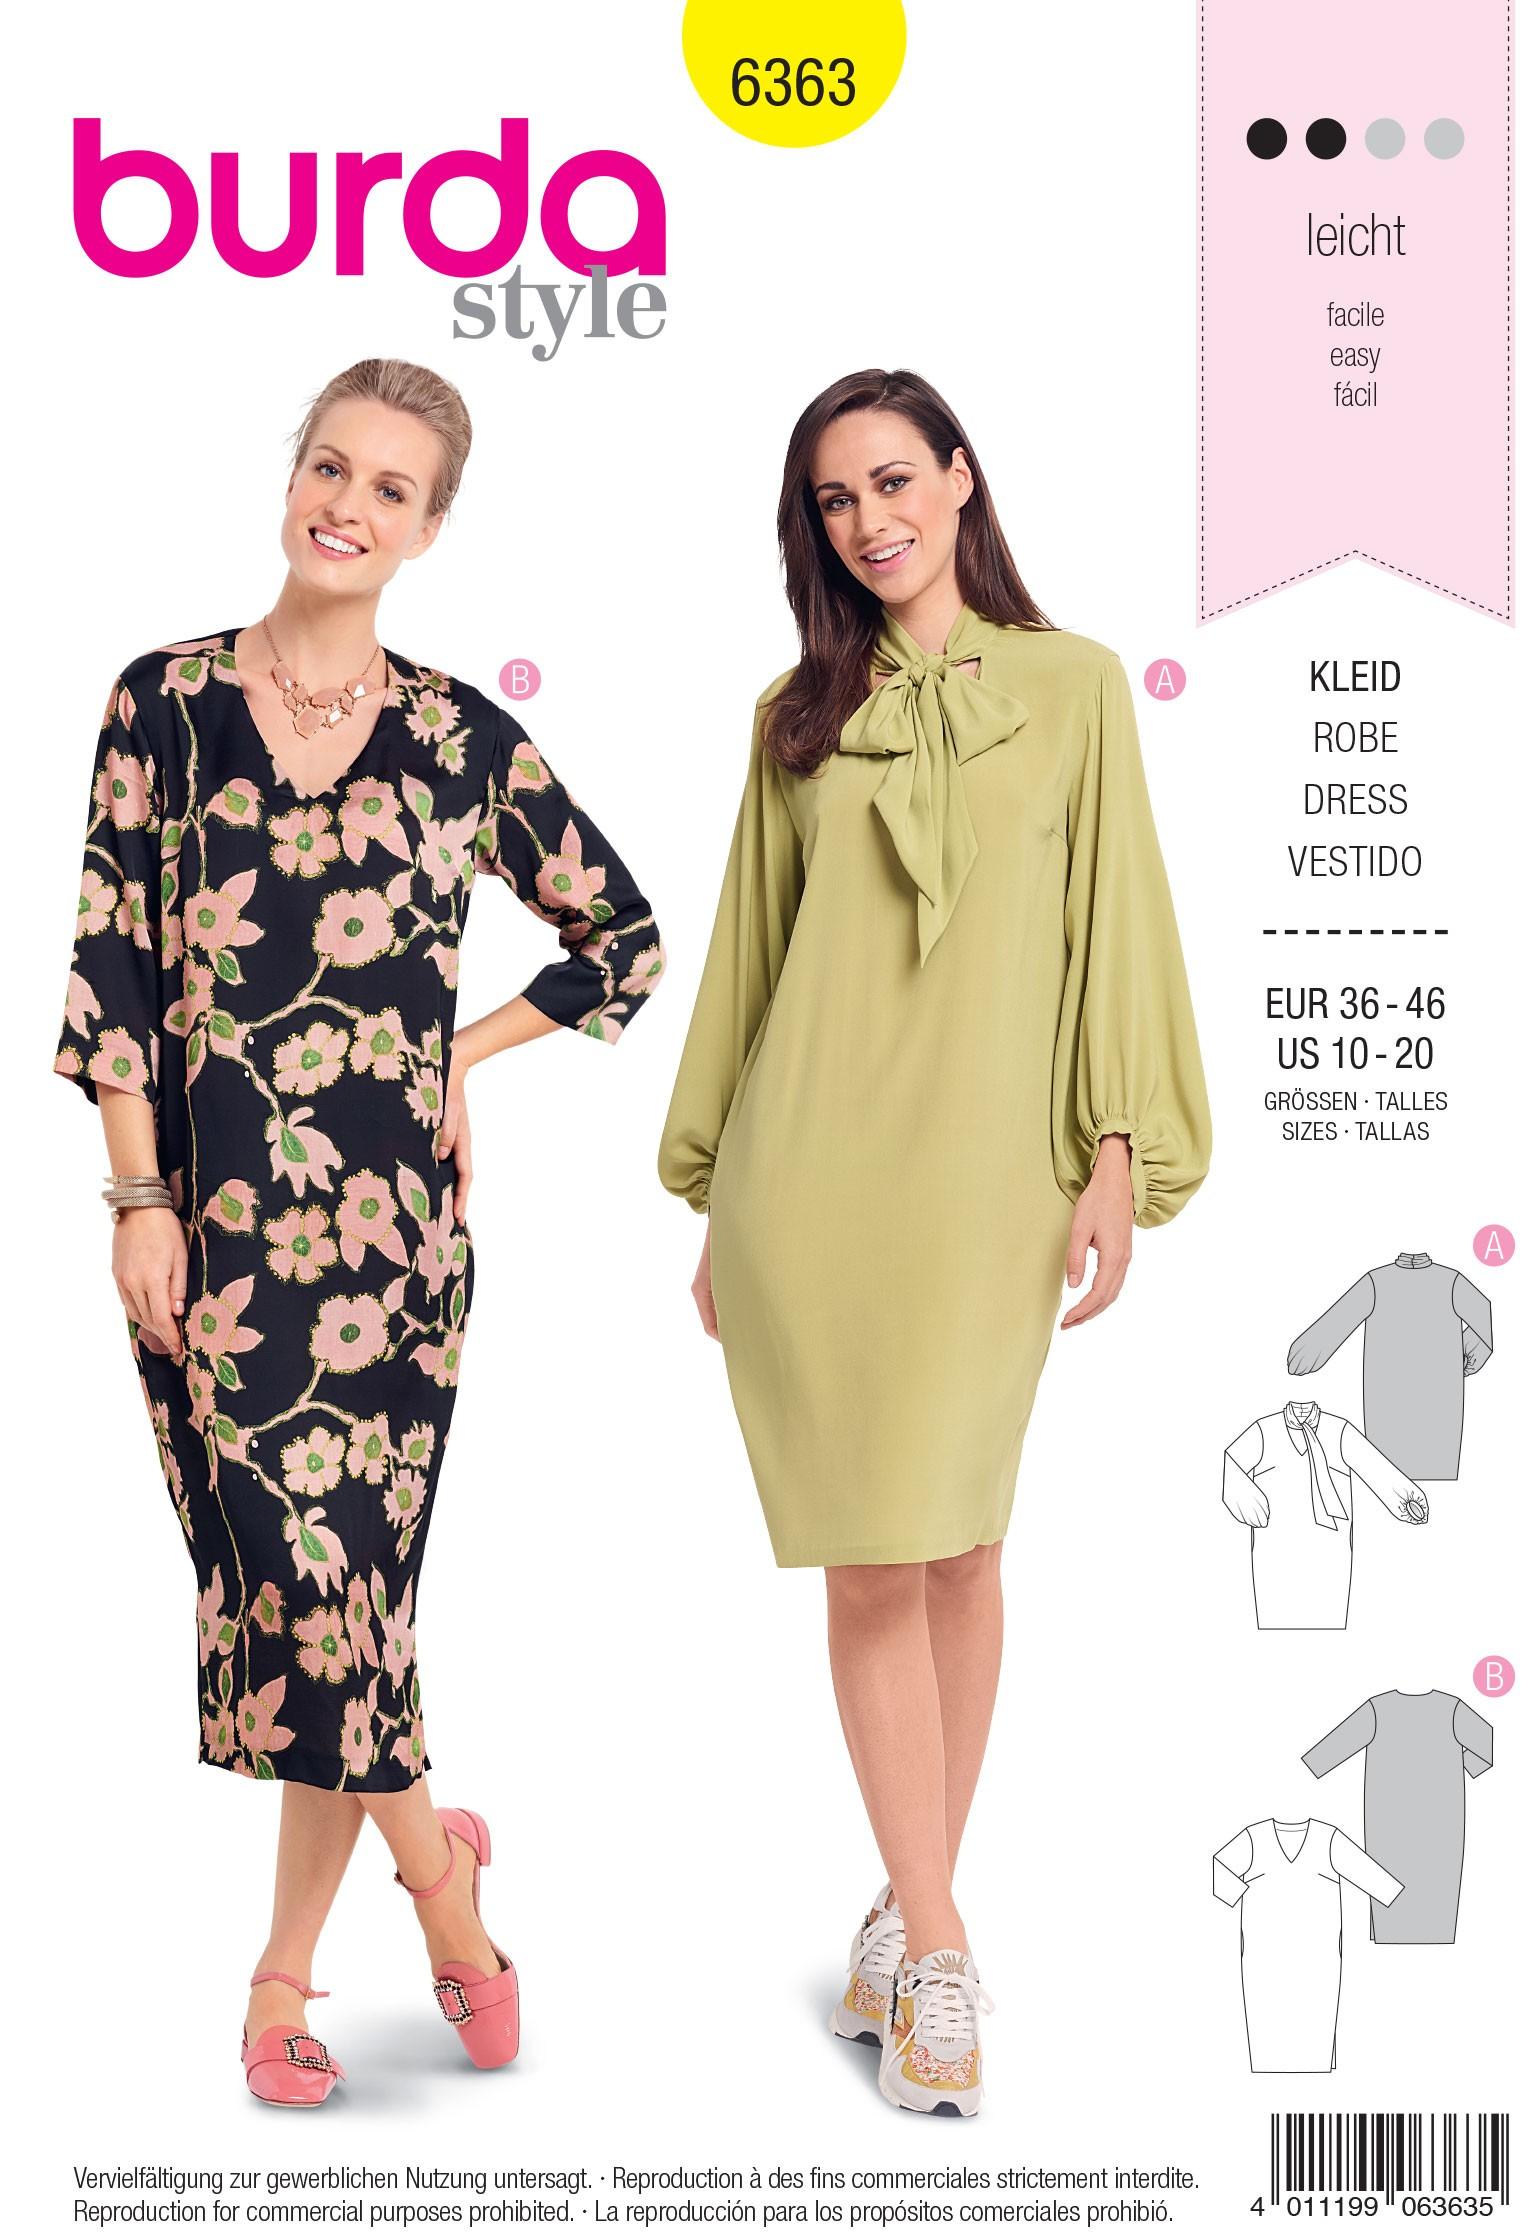 Burda Sewing Pattern 6360 Style Misses' Sporty Parka Rain Coat Jacket